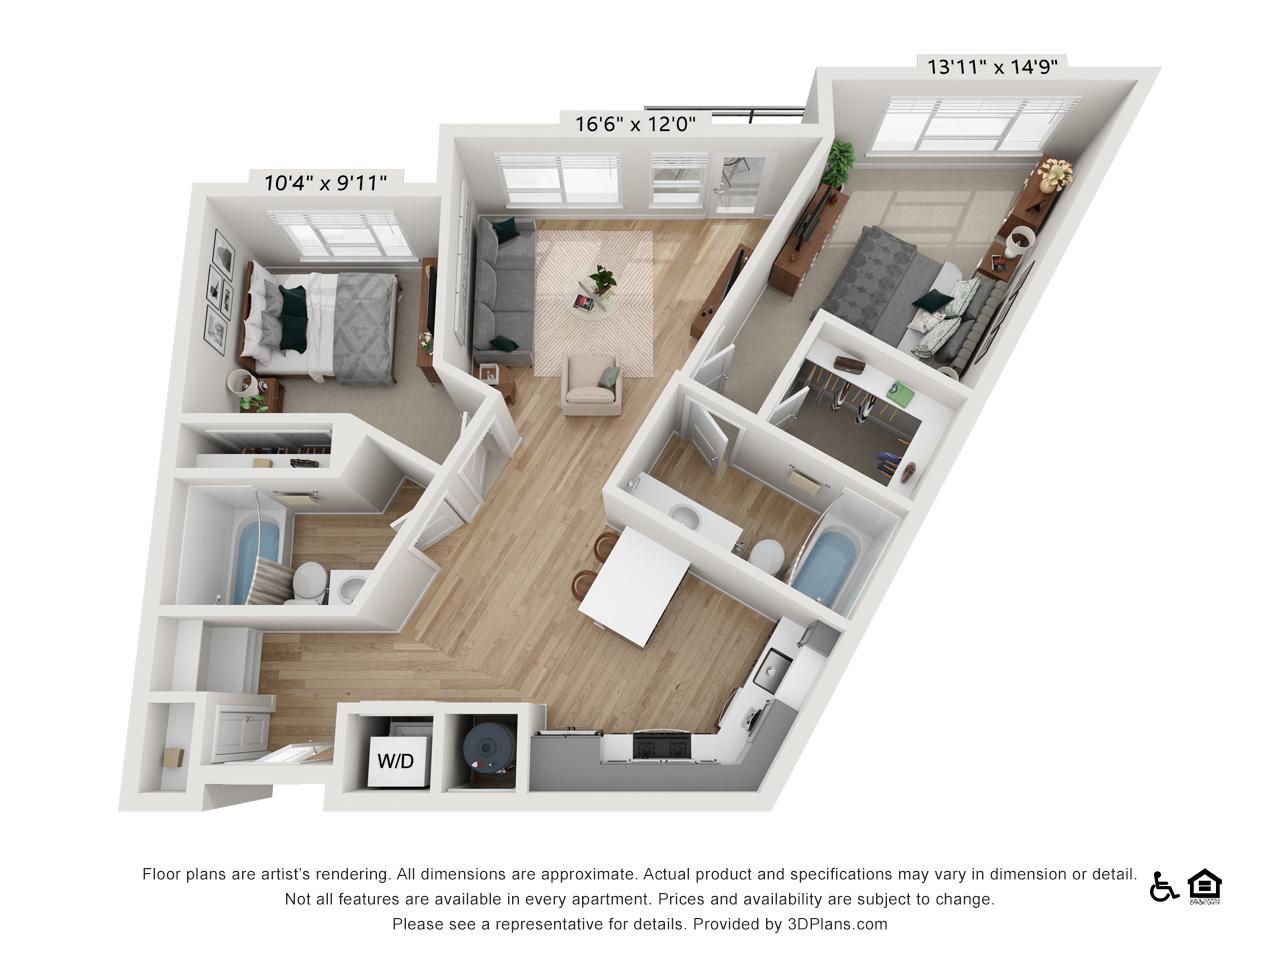 Two Bedroom A | 2 Bedrooms | 2 Bathrooms | 996-1,001 sq ft